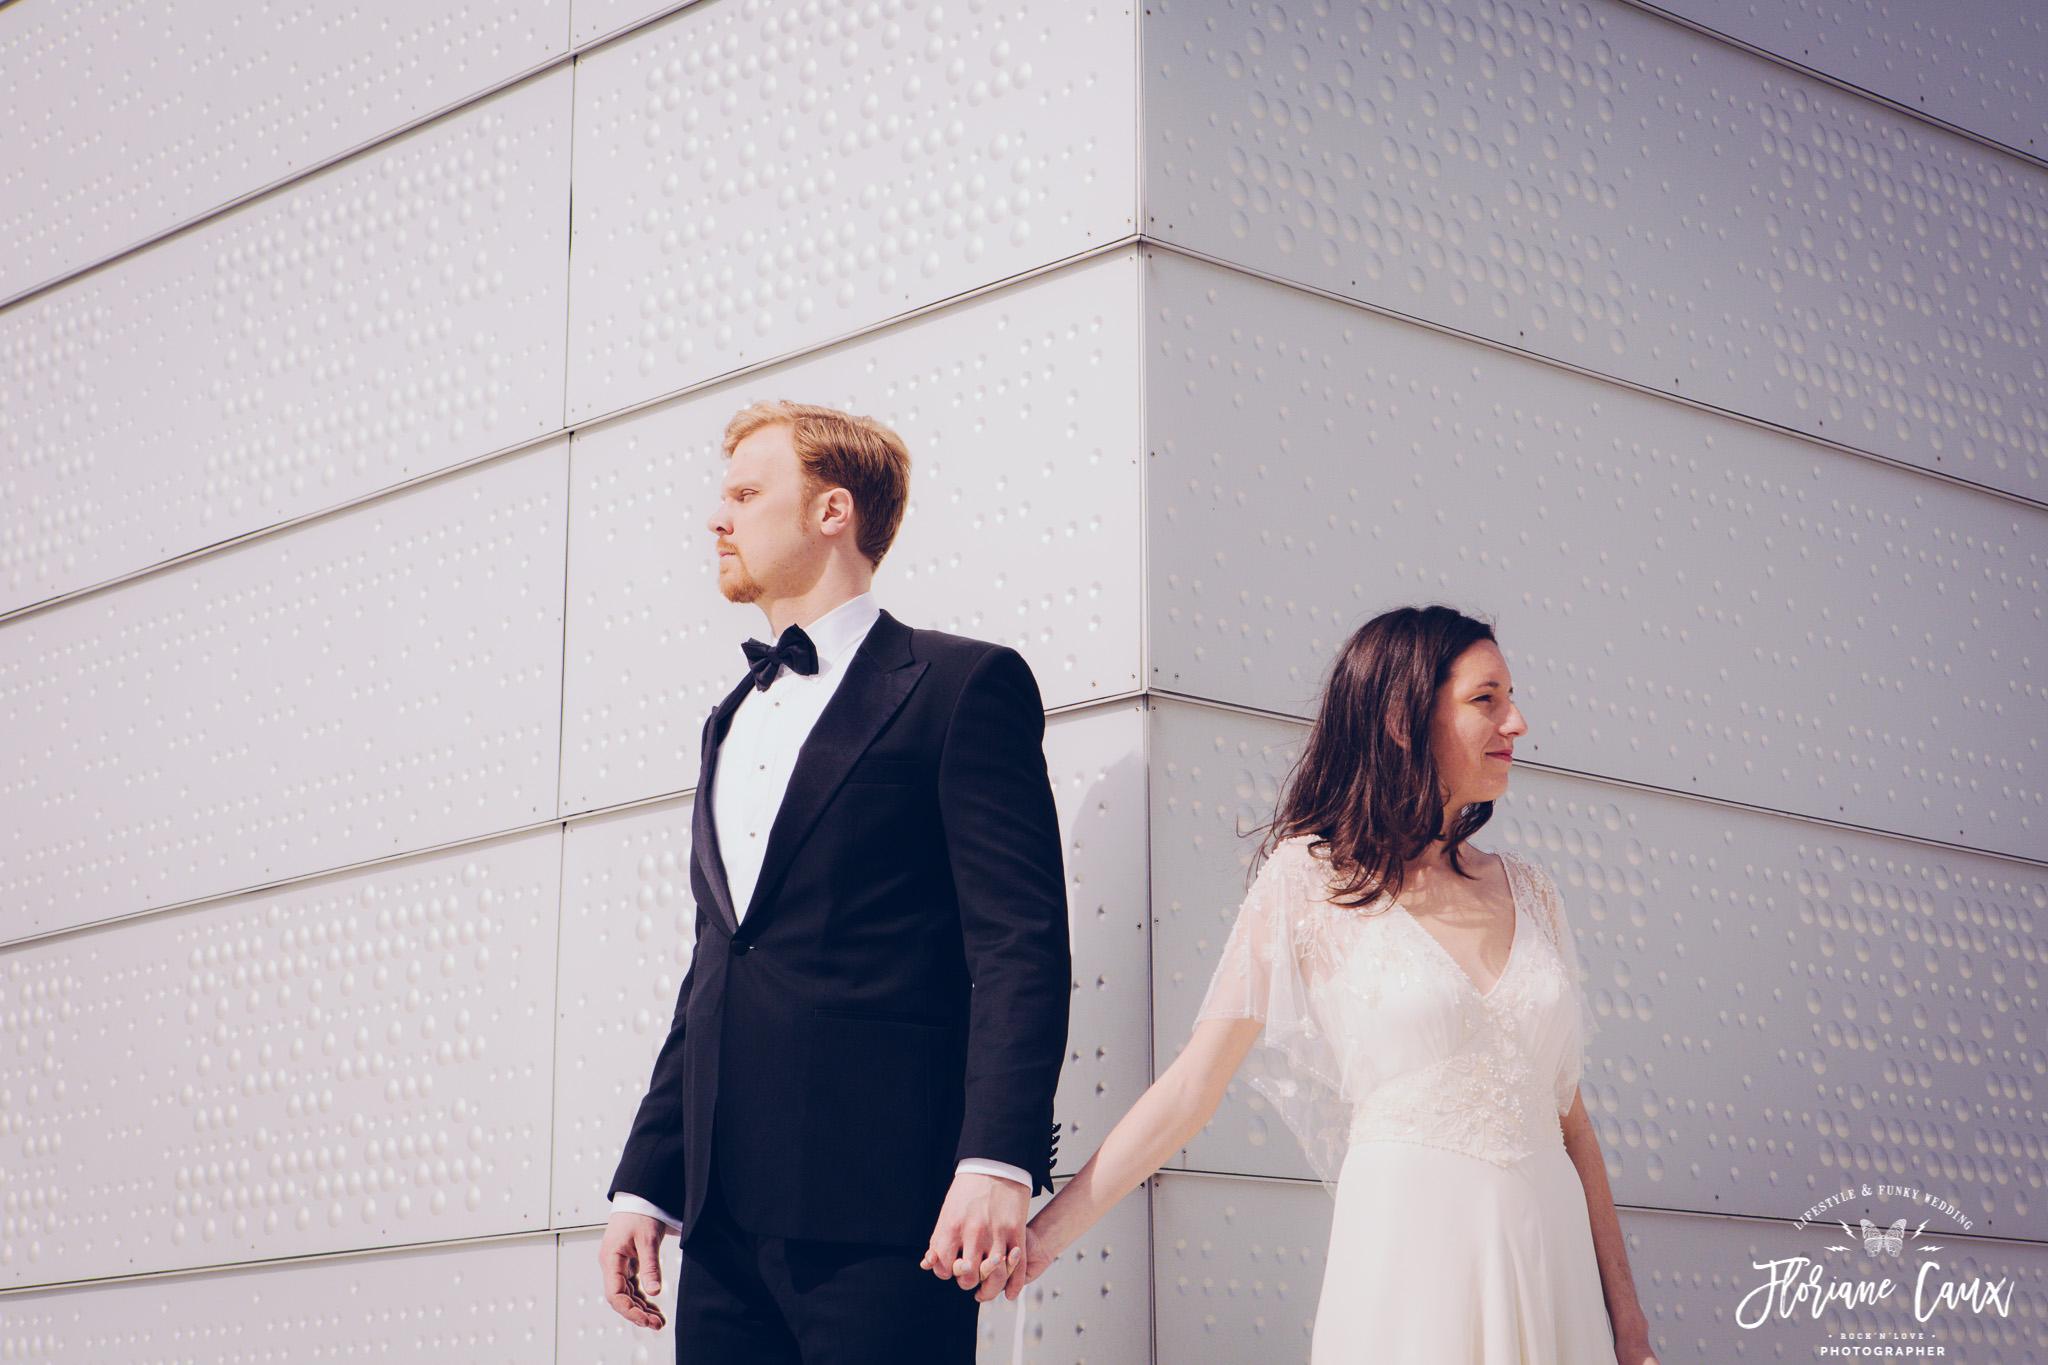 destination-wedding-photographer-oslo-norway-floriane-caux-69